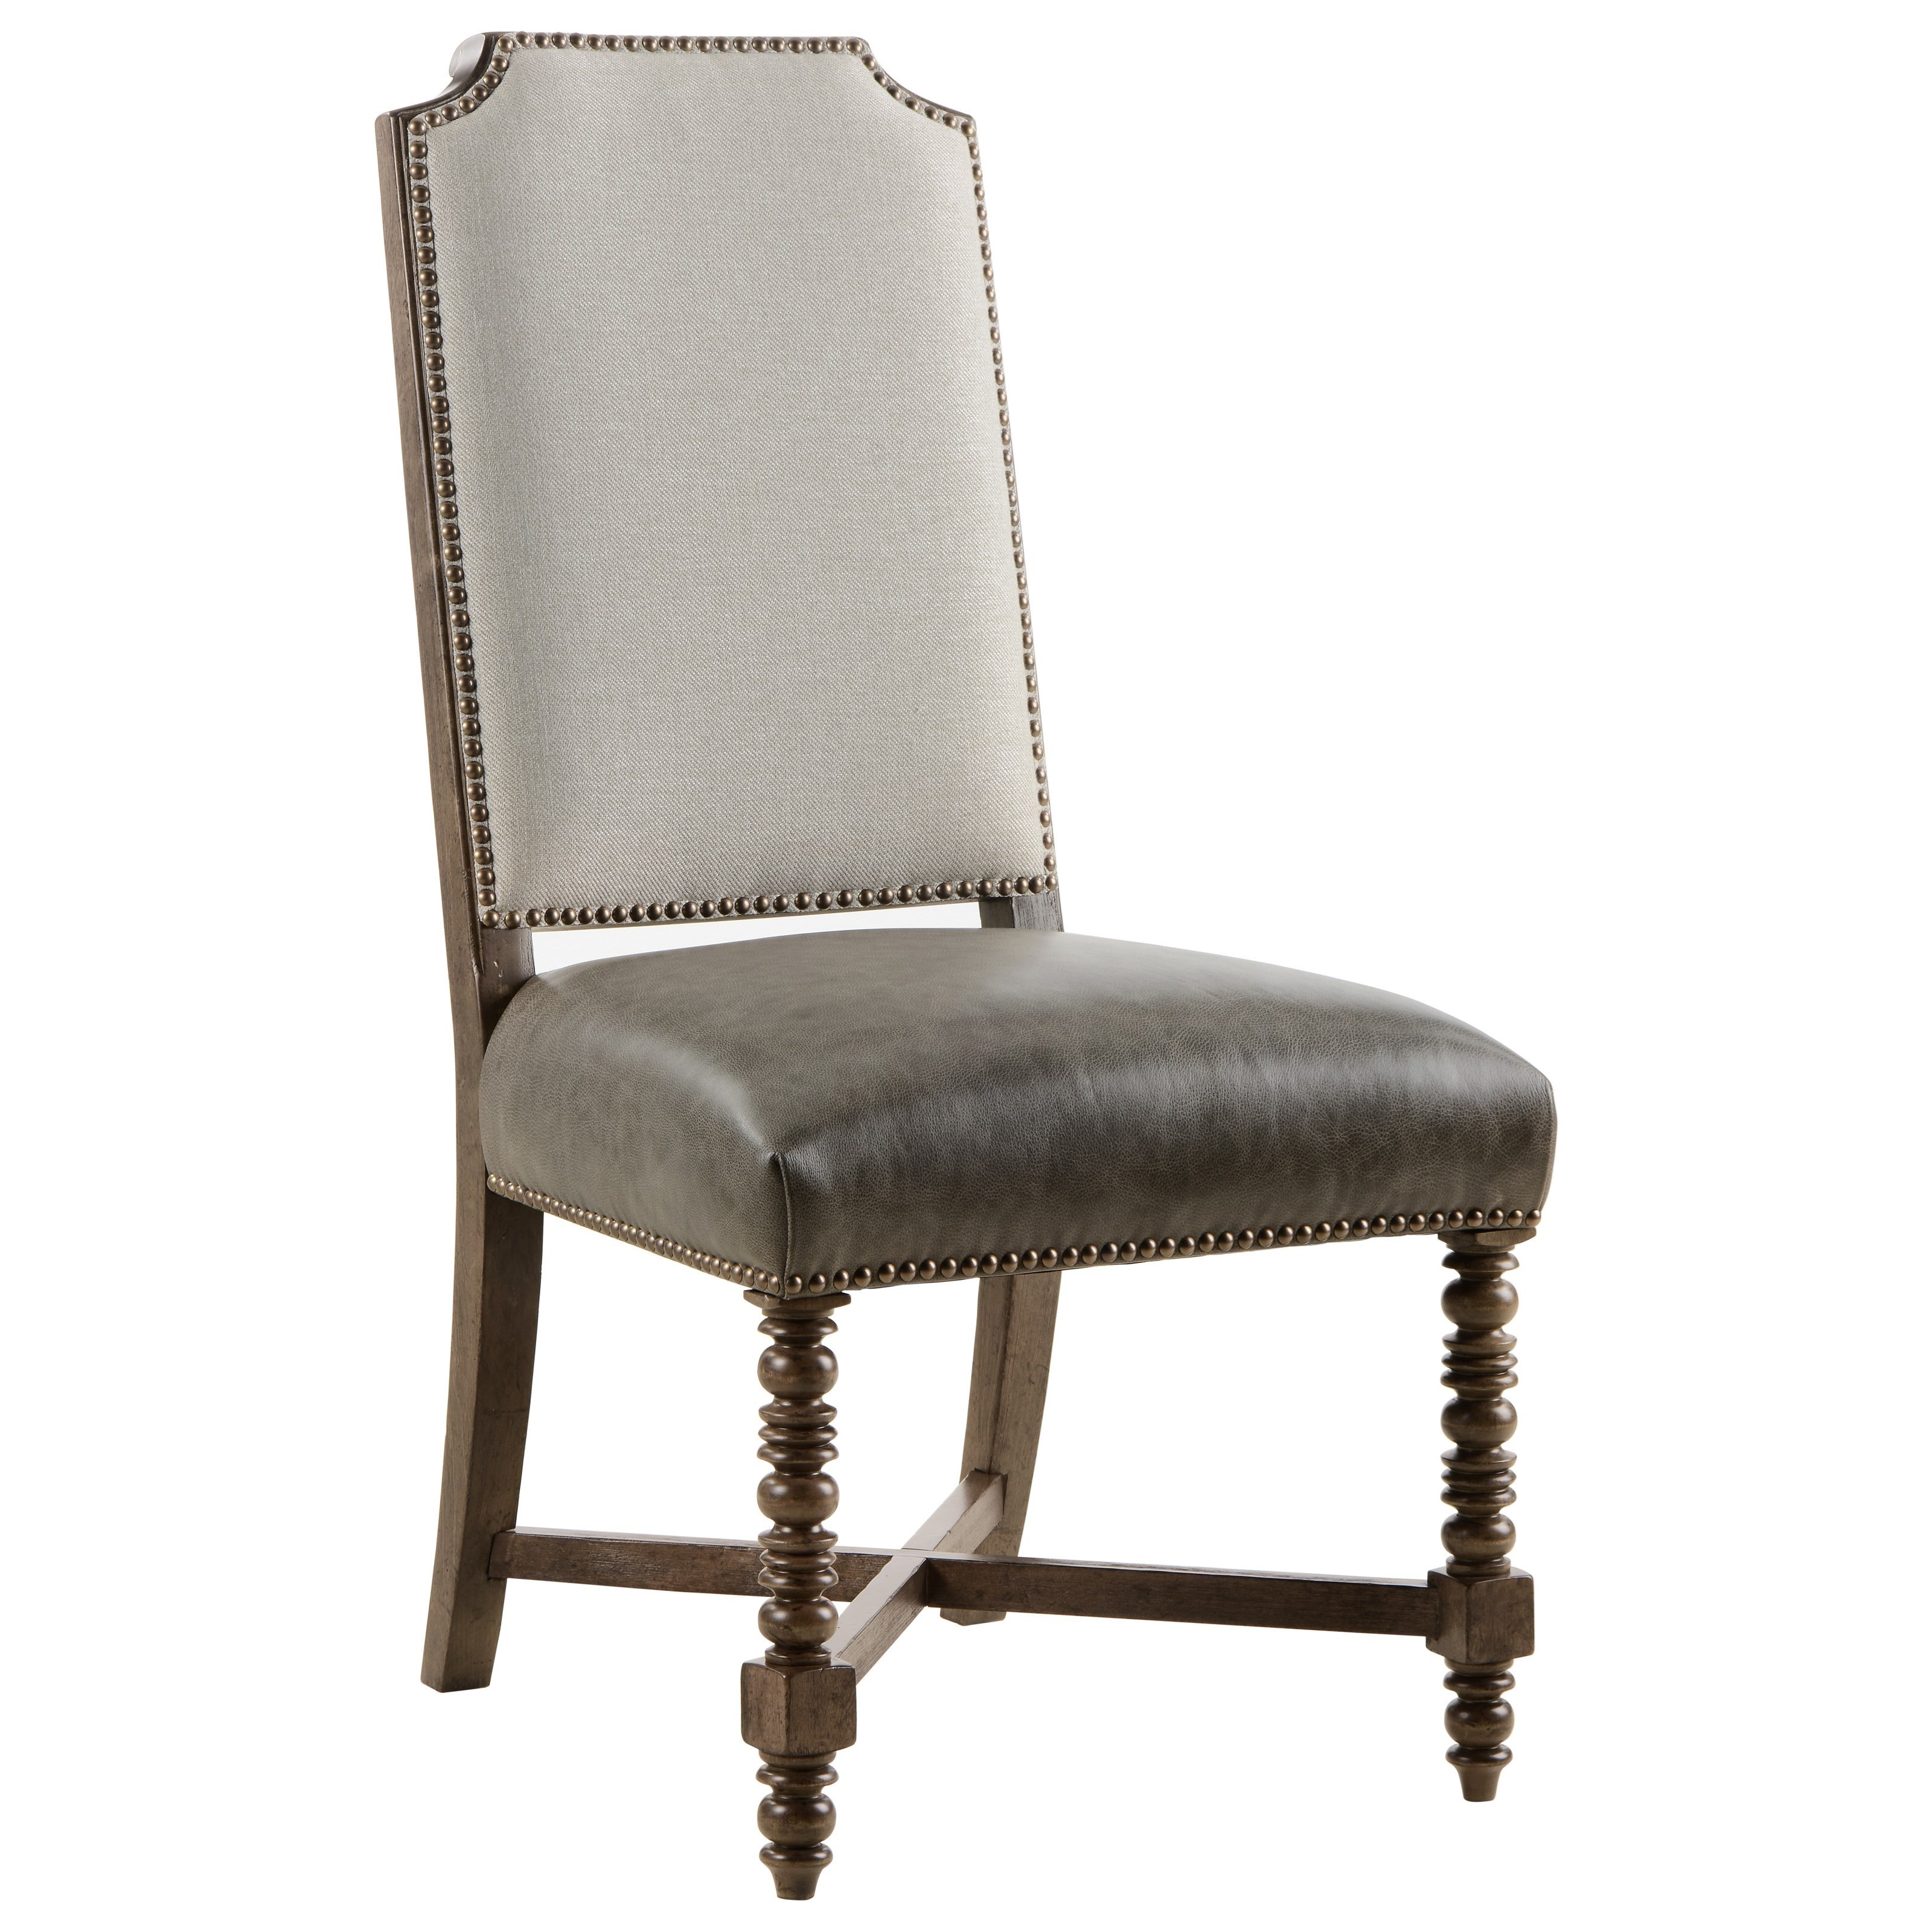 American Chapter Distiller's Upholstered Back Side Chair by Klien Furniture at Sprintz Furniture